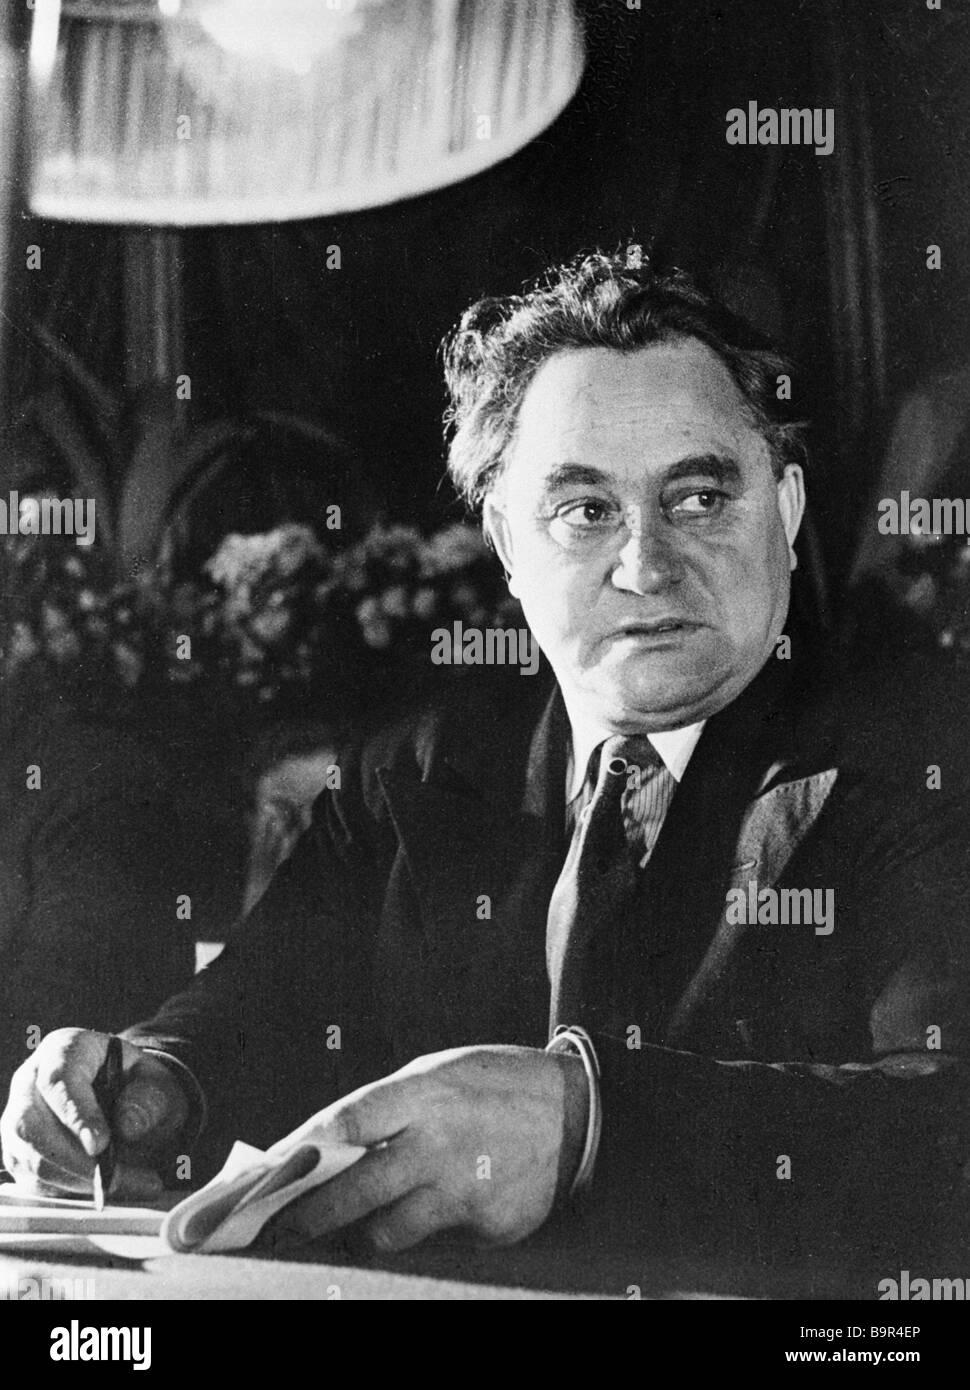 6489de330e55 Georgi Dimitrov at the 6th Communist International congress Moscow 1935  Dimitrov 1882 1949 was prominent in